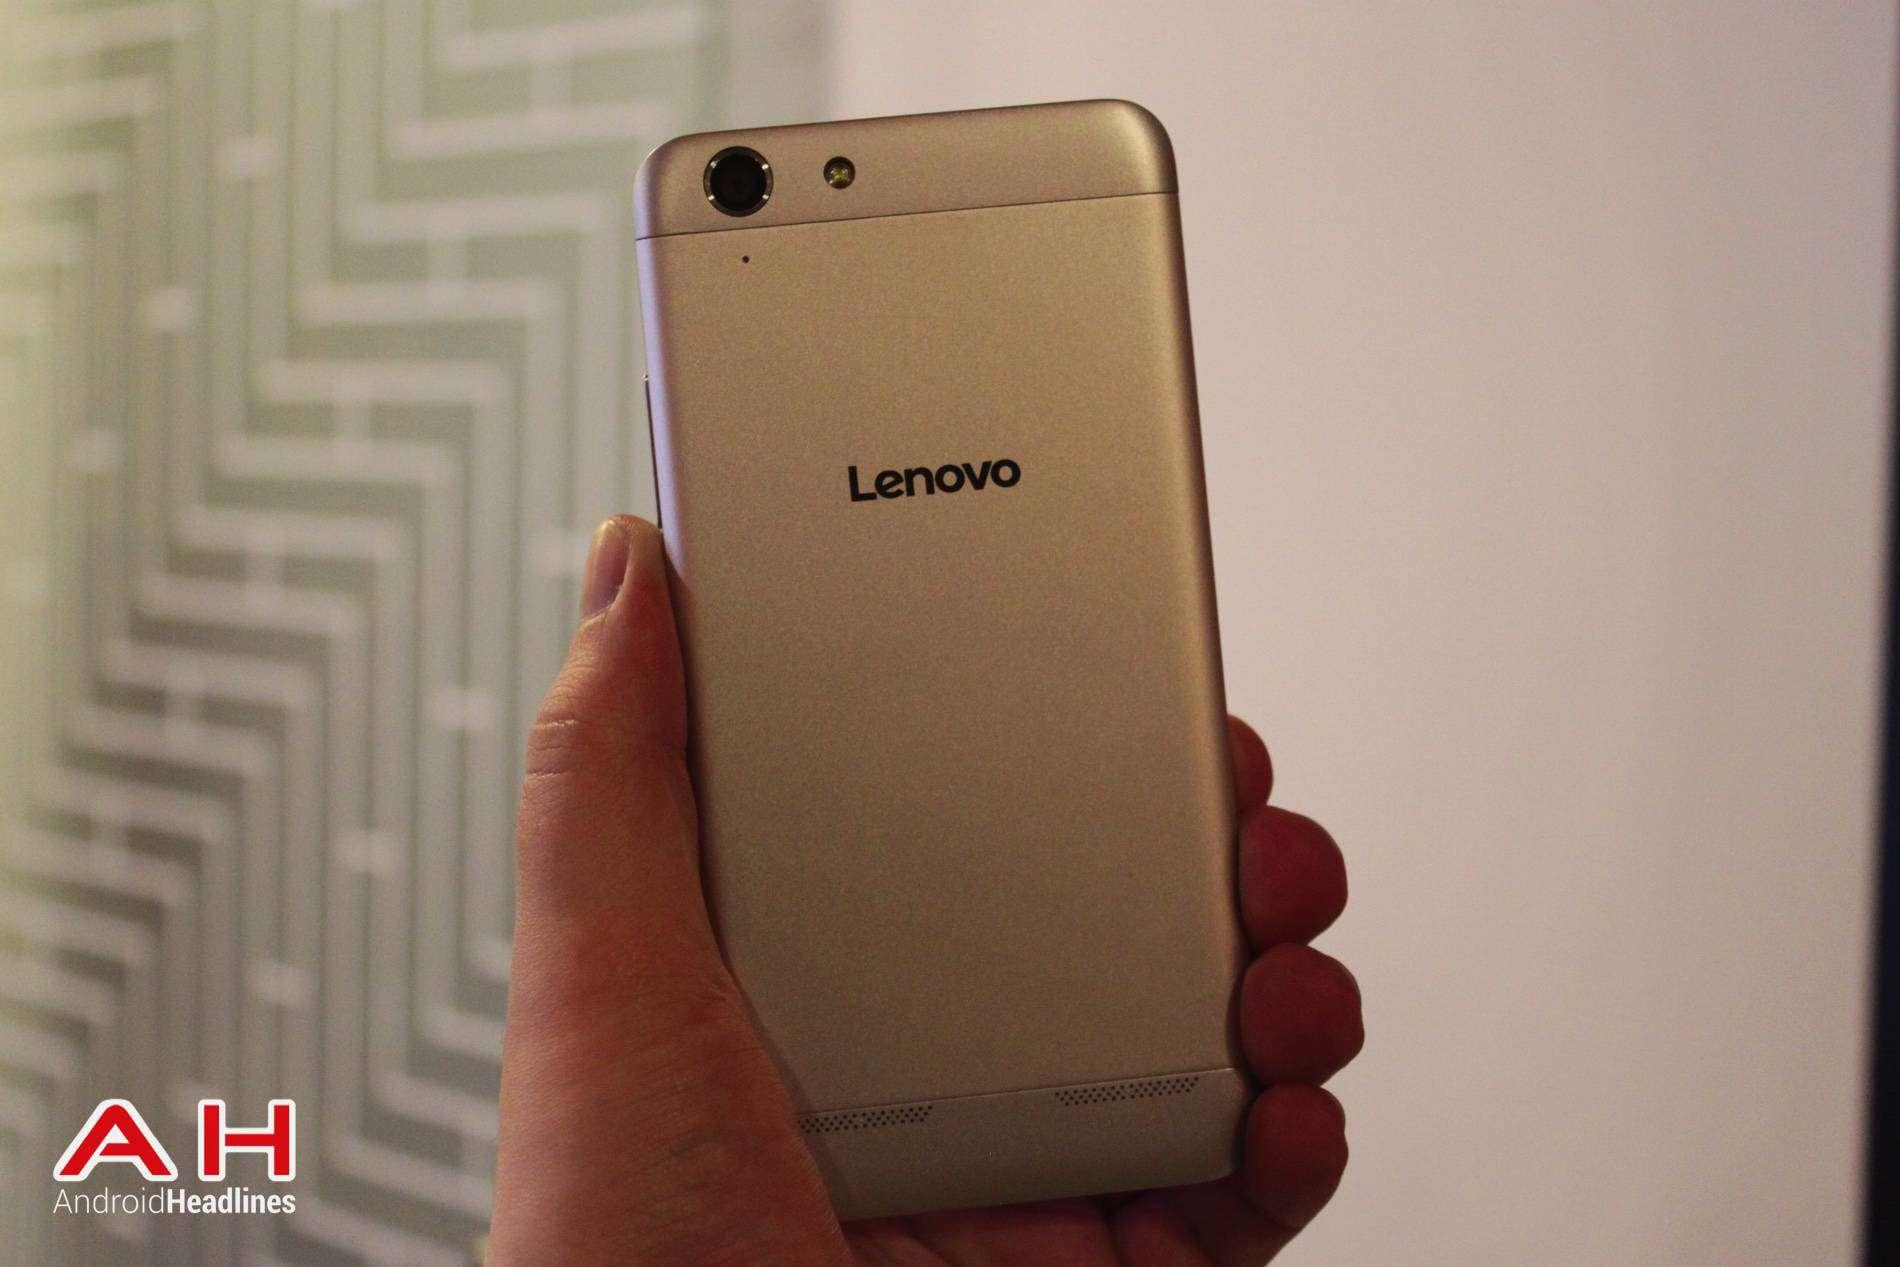 Lenovo Vibe K5 Plus MWC AH 4